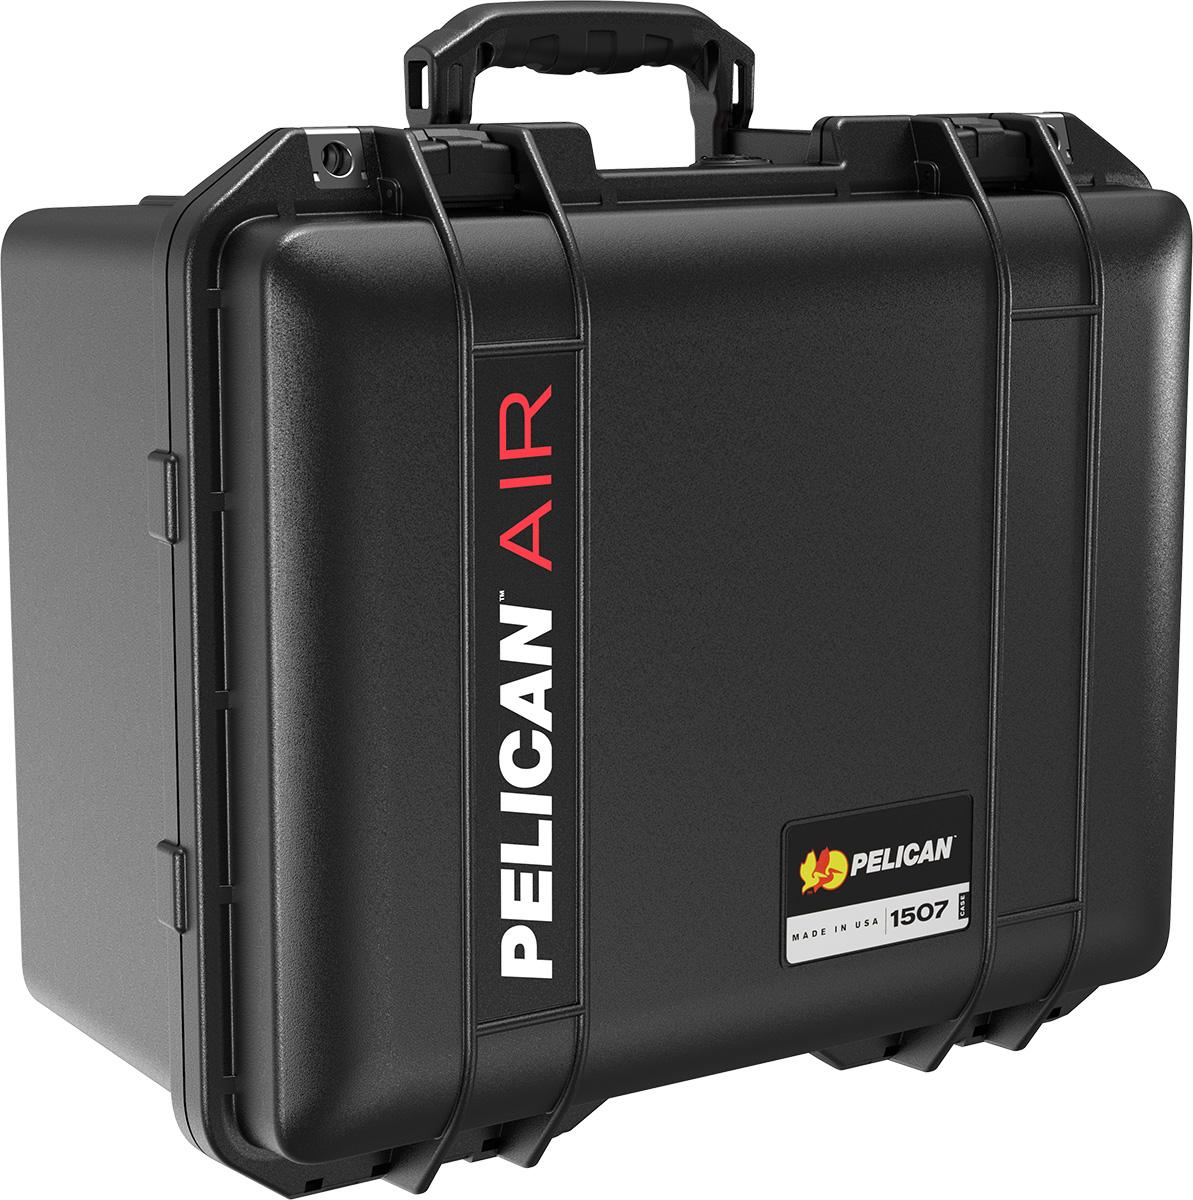 pelican air 1507 black watertight case